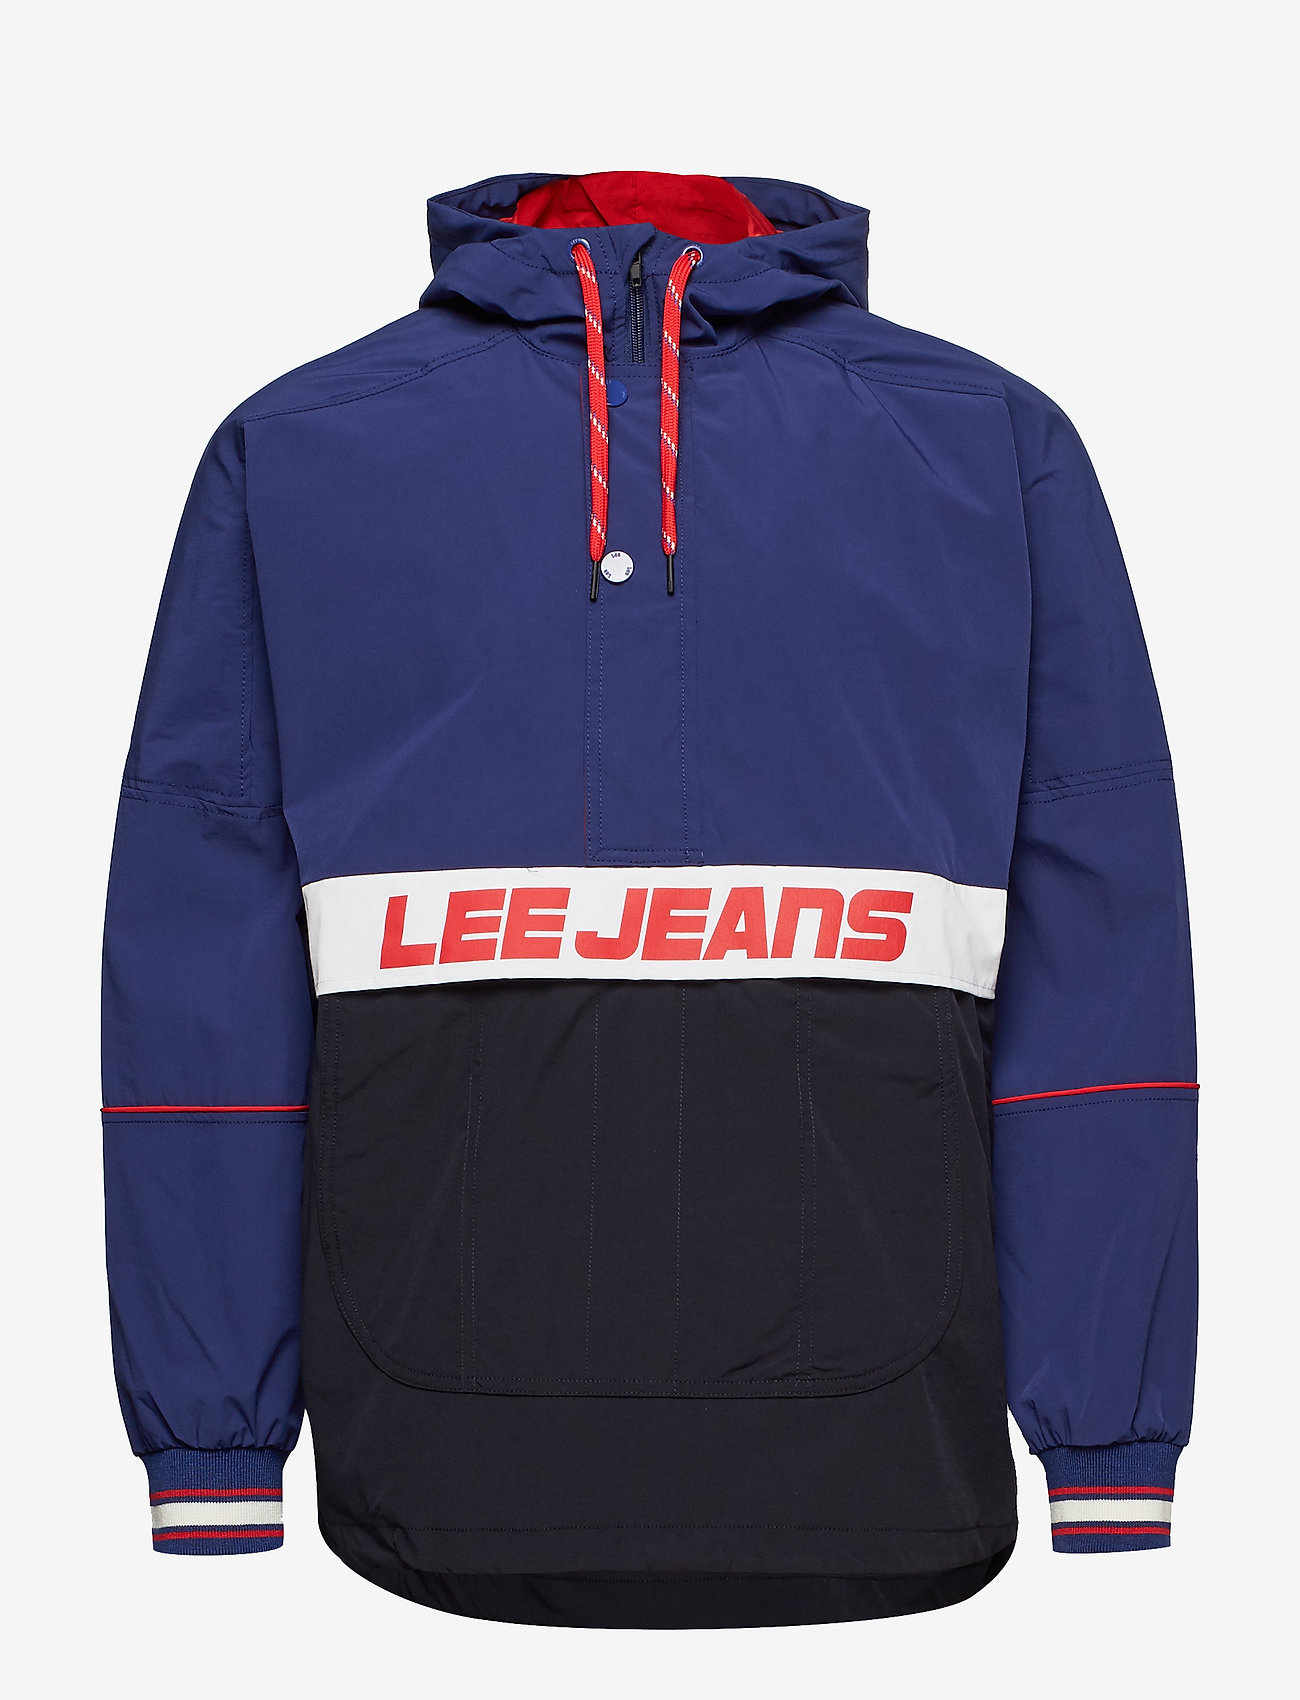 Lee Jeans Anorak - Jackets & Coats